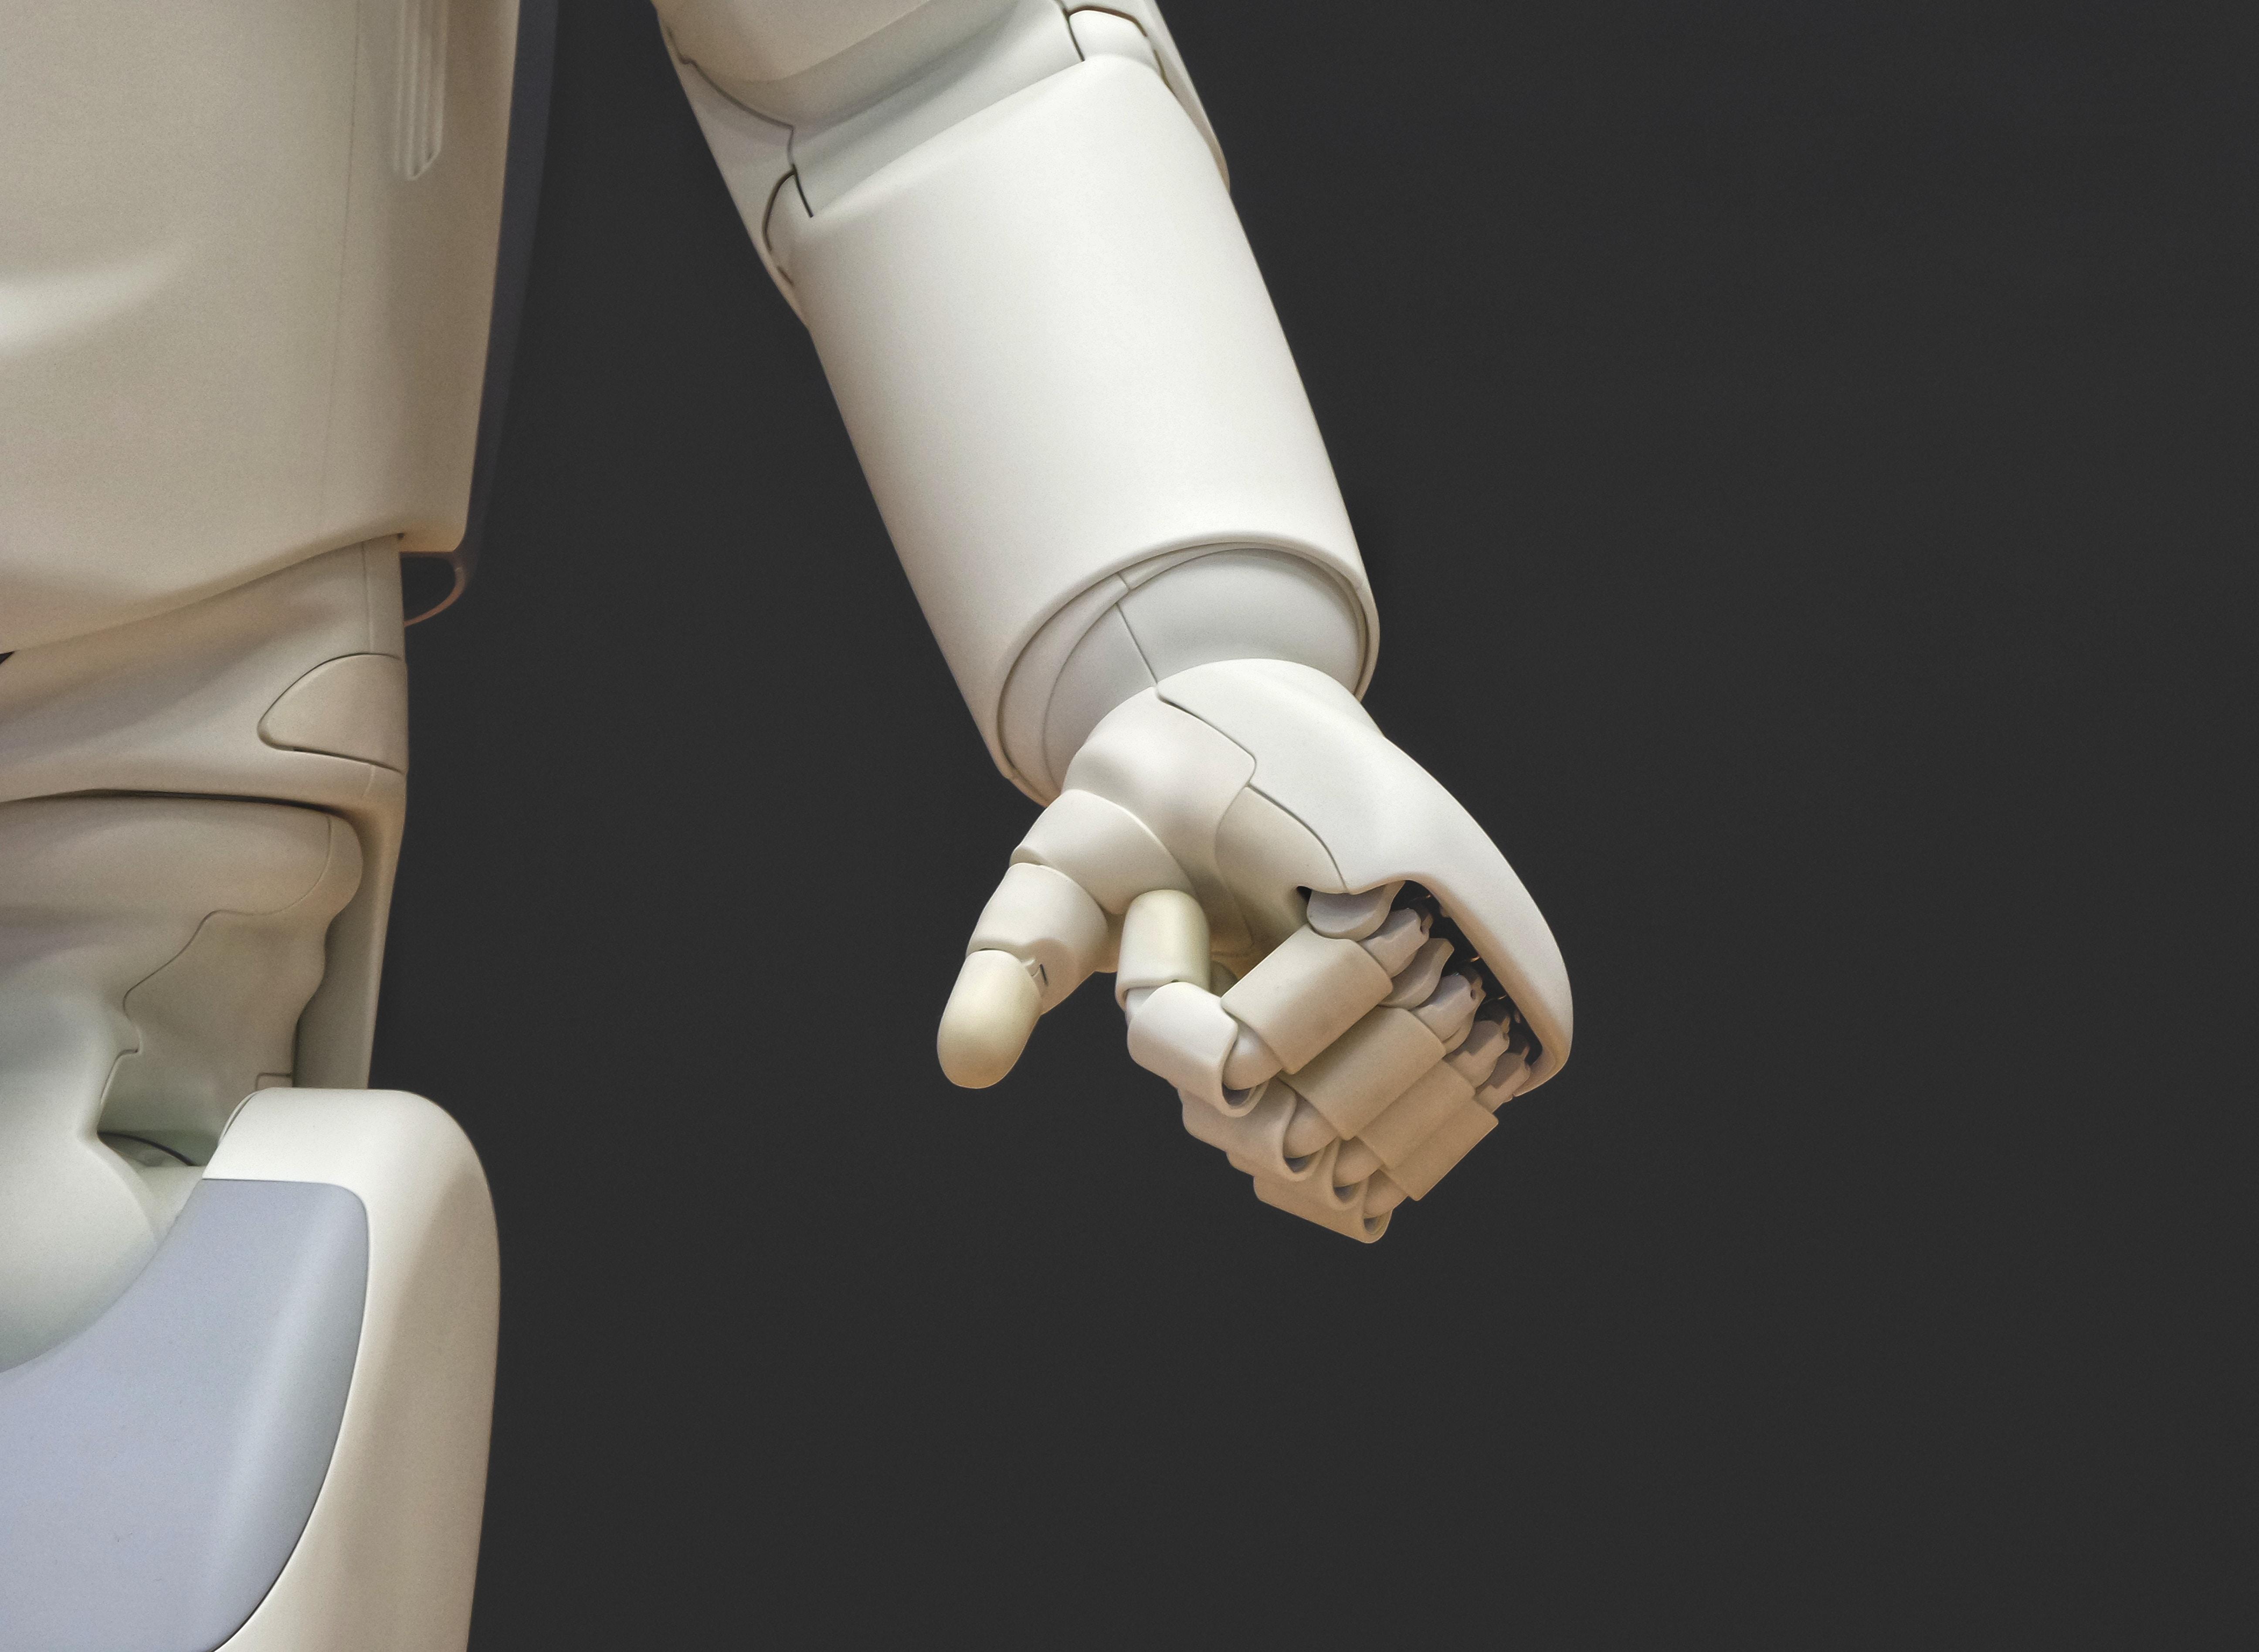 What Do Cybernetics Look Like?